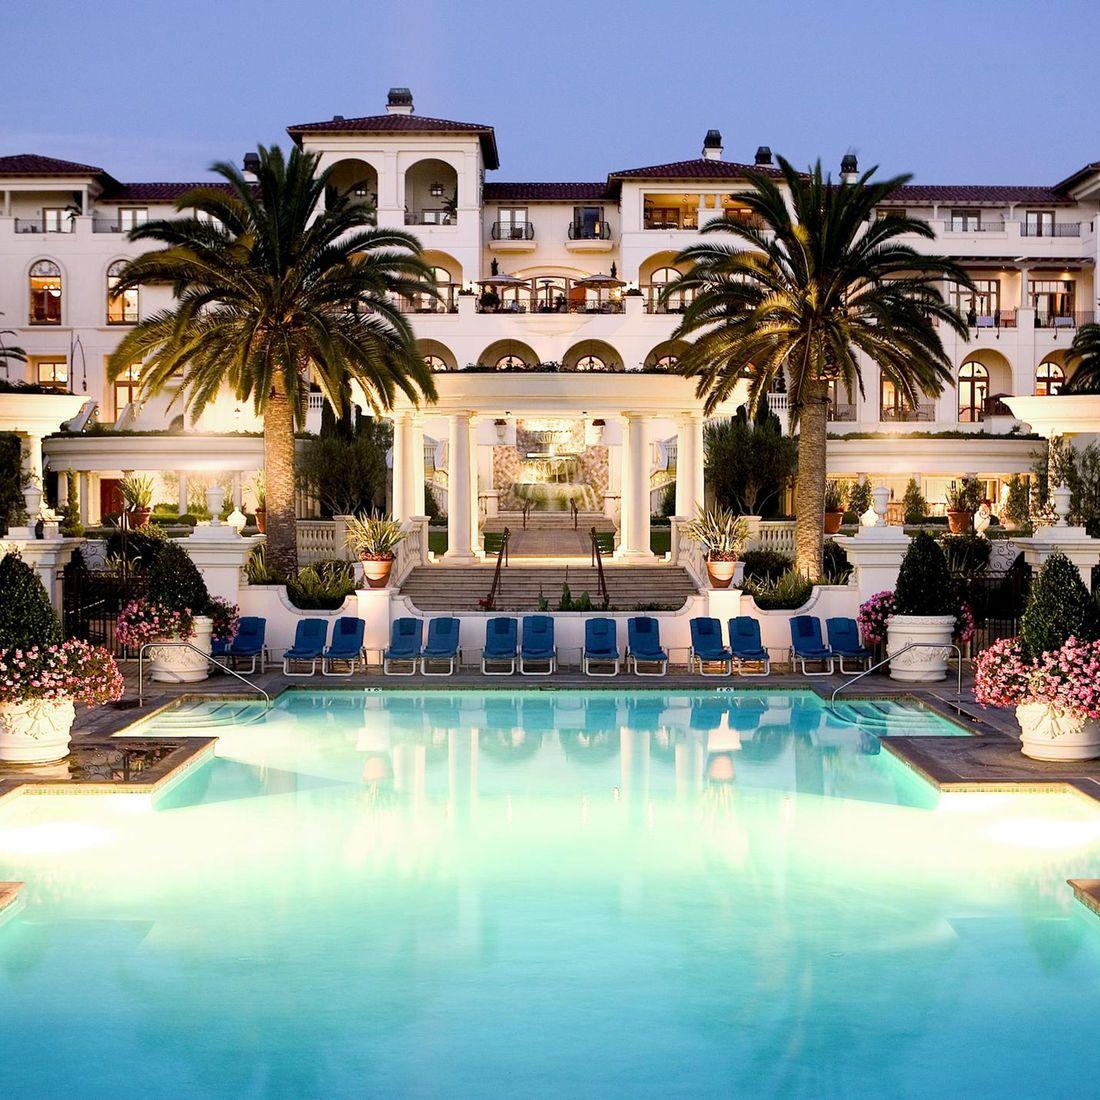 Laguna Niguel Hotels 5 Star 2018 World'